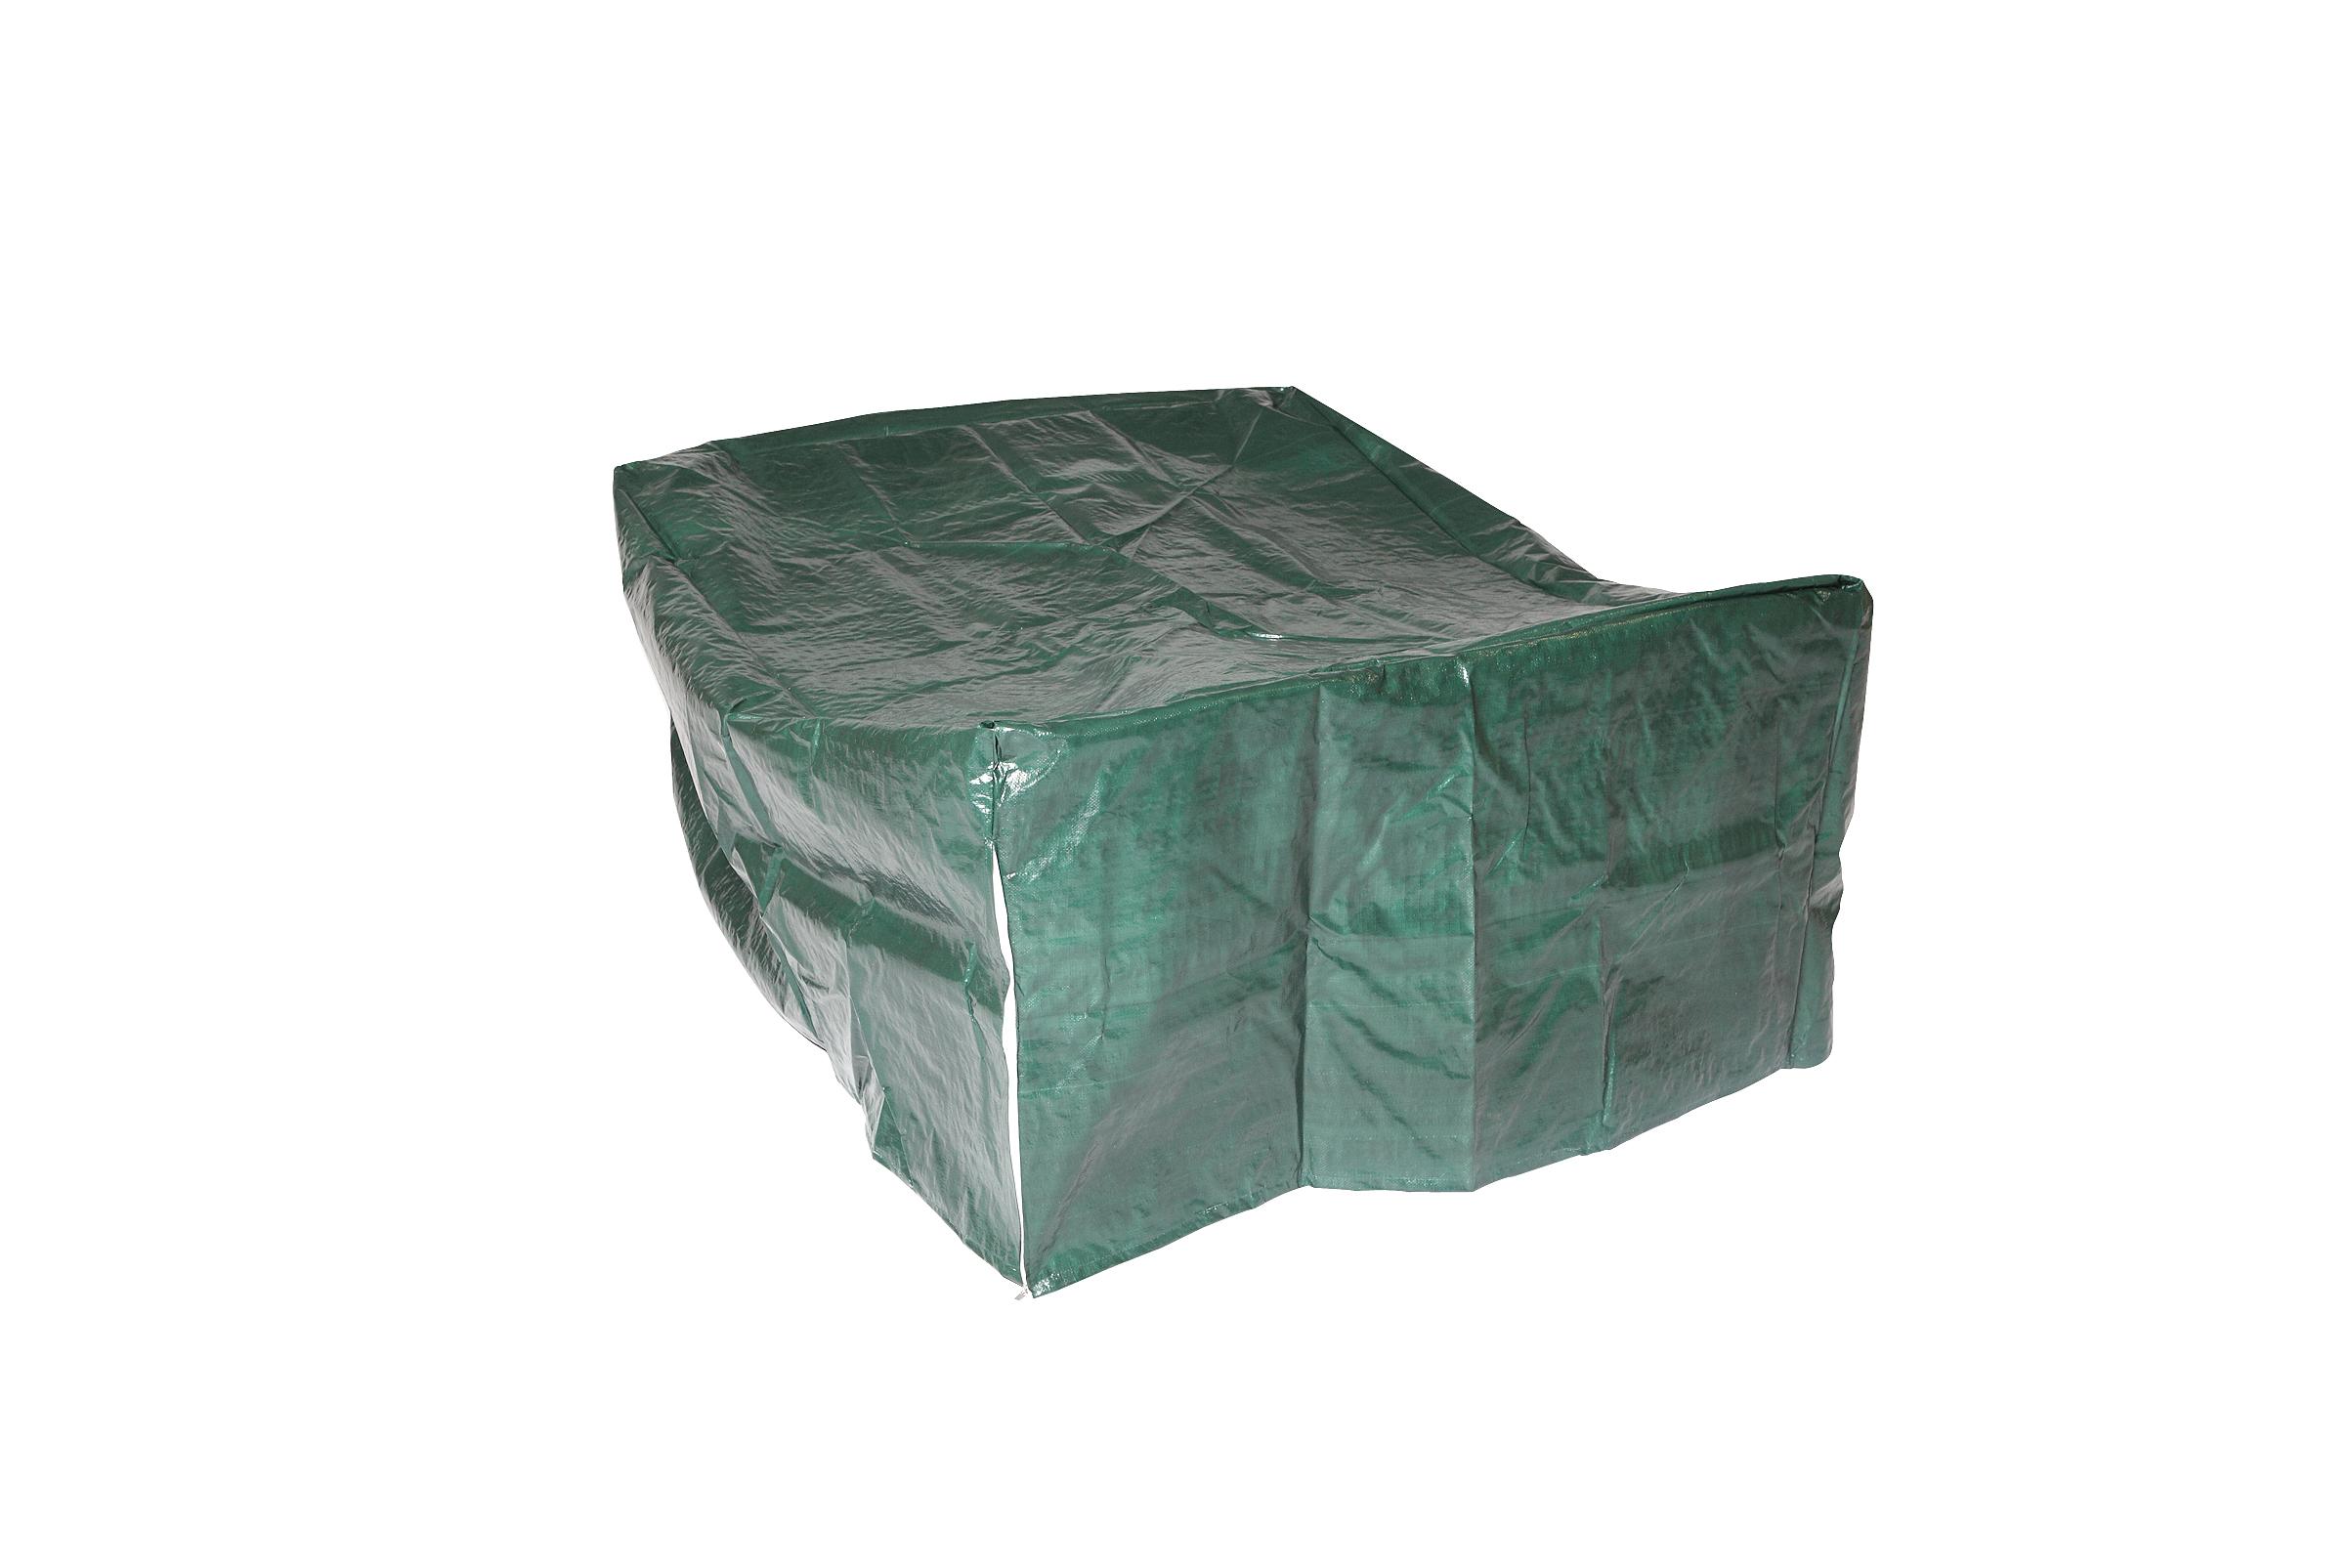 abdeckplanen schutzh llen f r den garten dito24. Black Bedroom Furniture Sets. Home Design Ideas